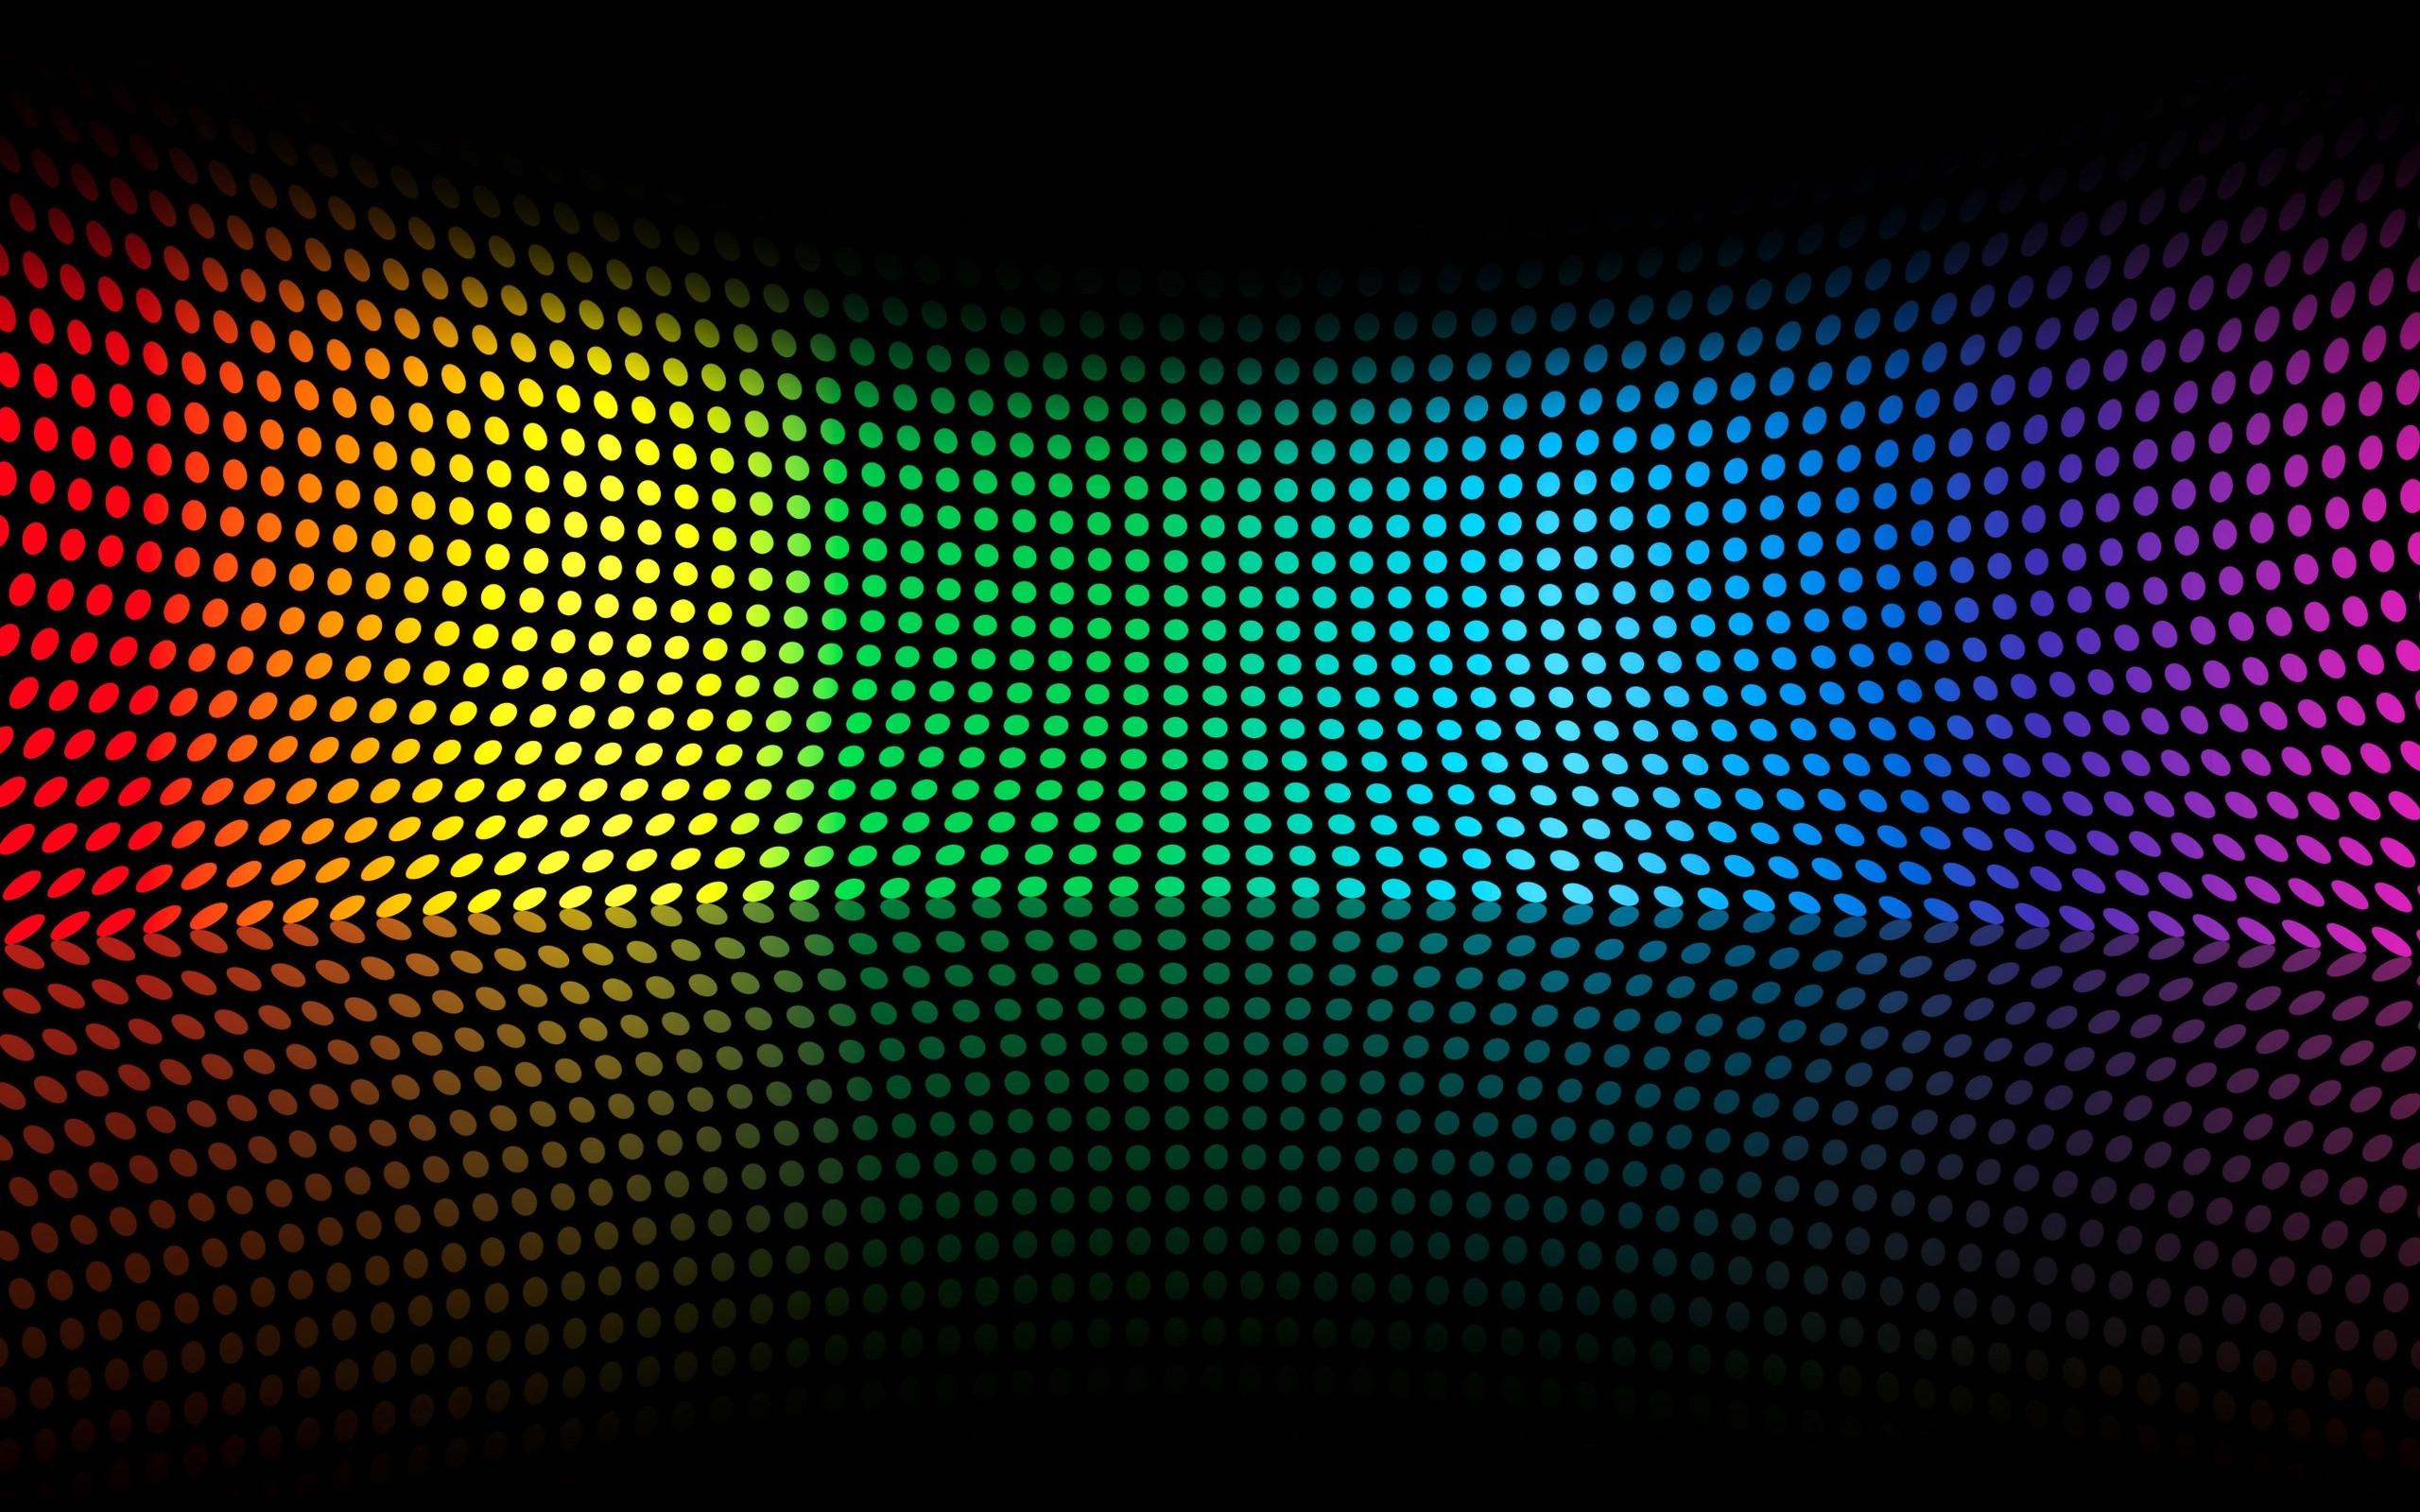 download colors hd wallpaper - photo #38